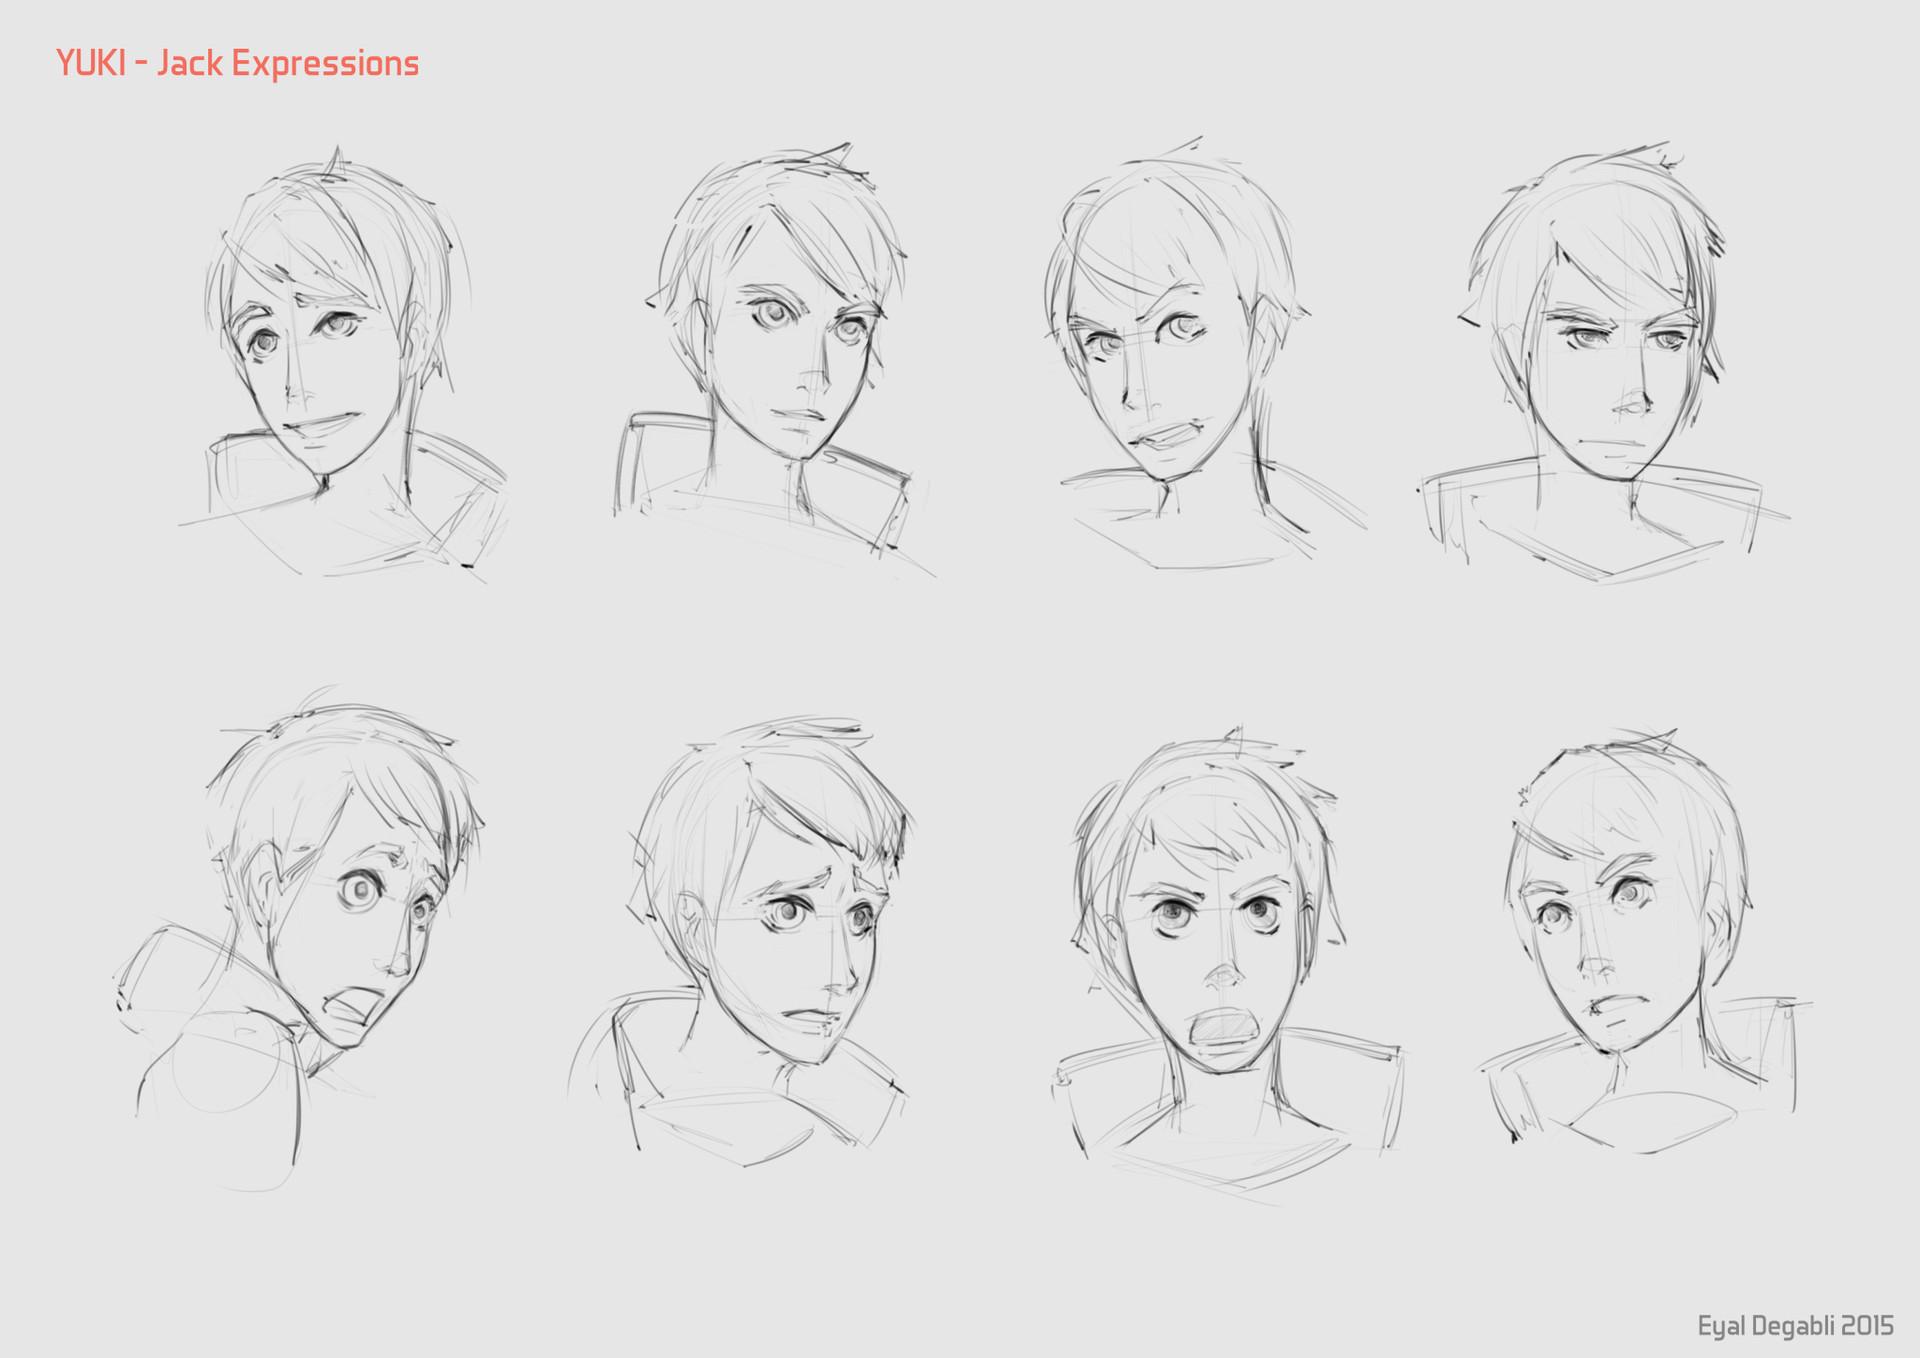 Eyal degabli 10 expressions jack